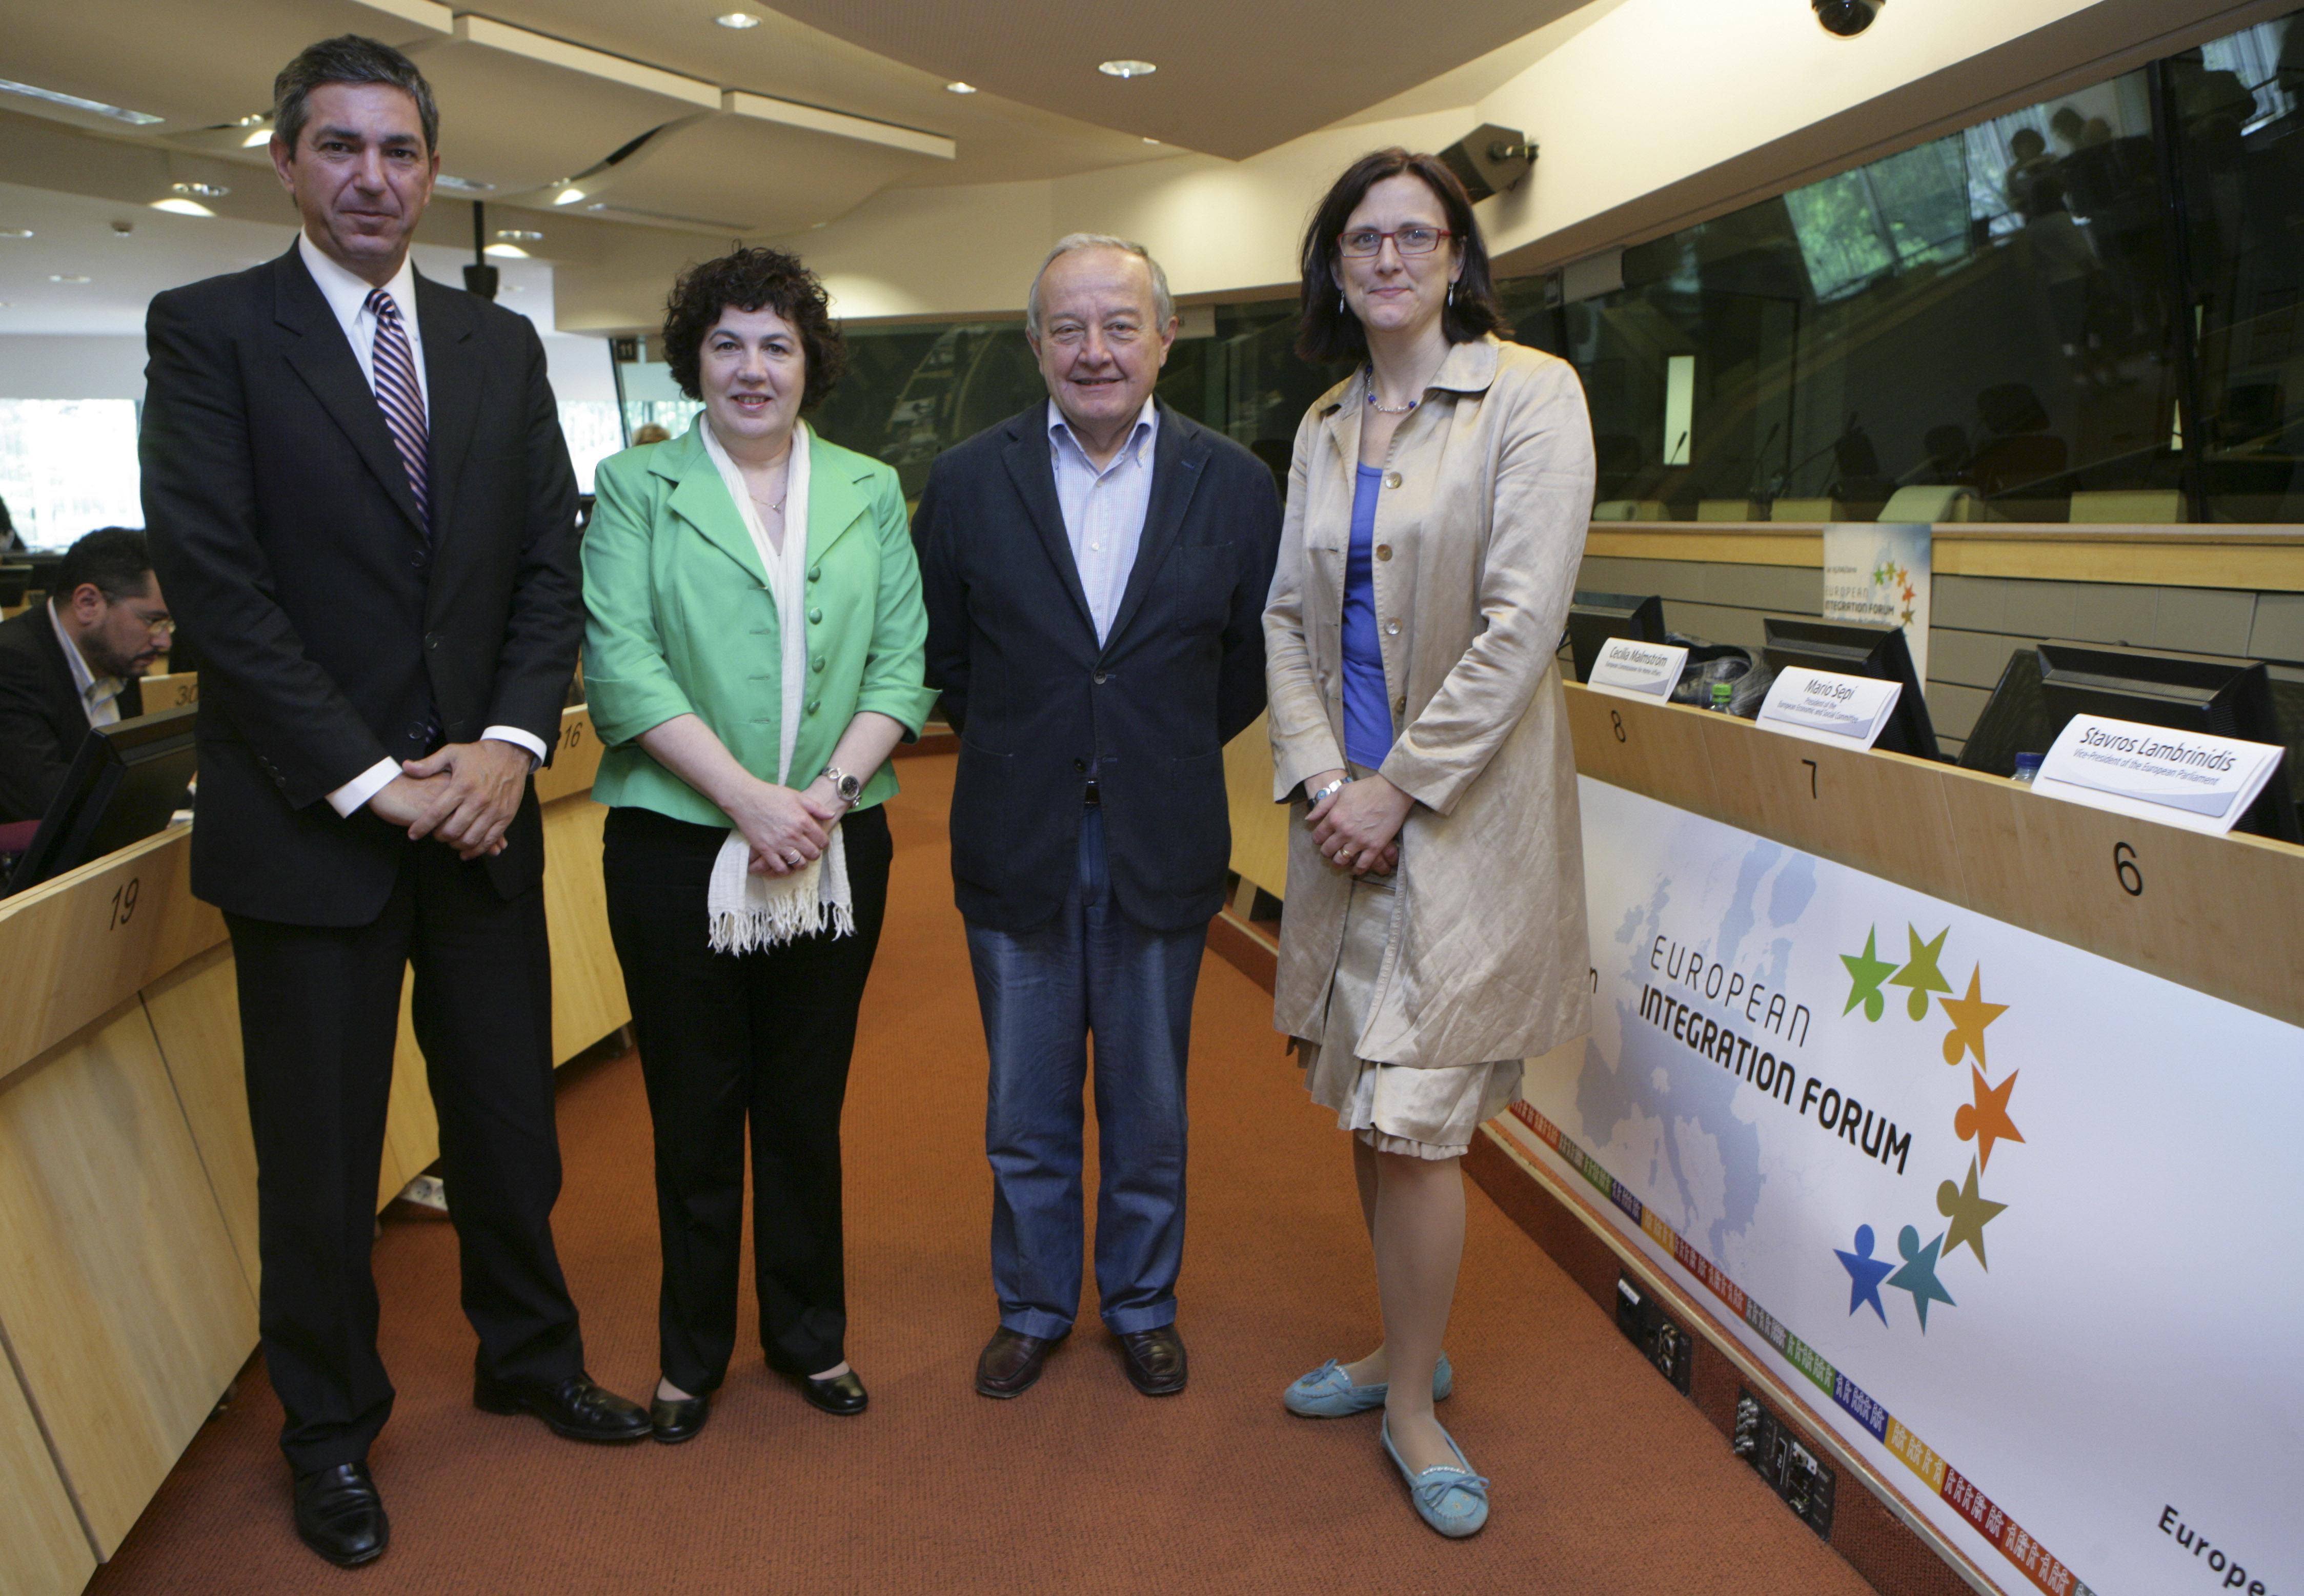 18. EESC President Mario Sepi with the key-note speakers: Mr Lambrinidis, Ms Rodriguez Pardo and Ms Malmström